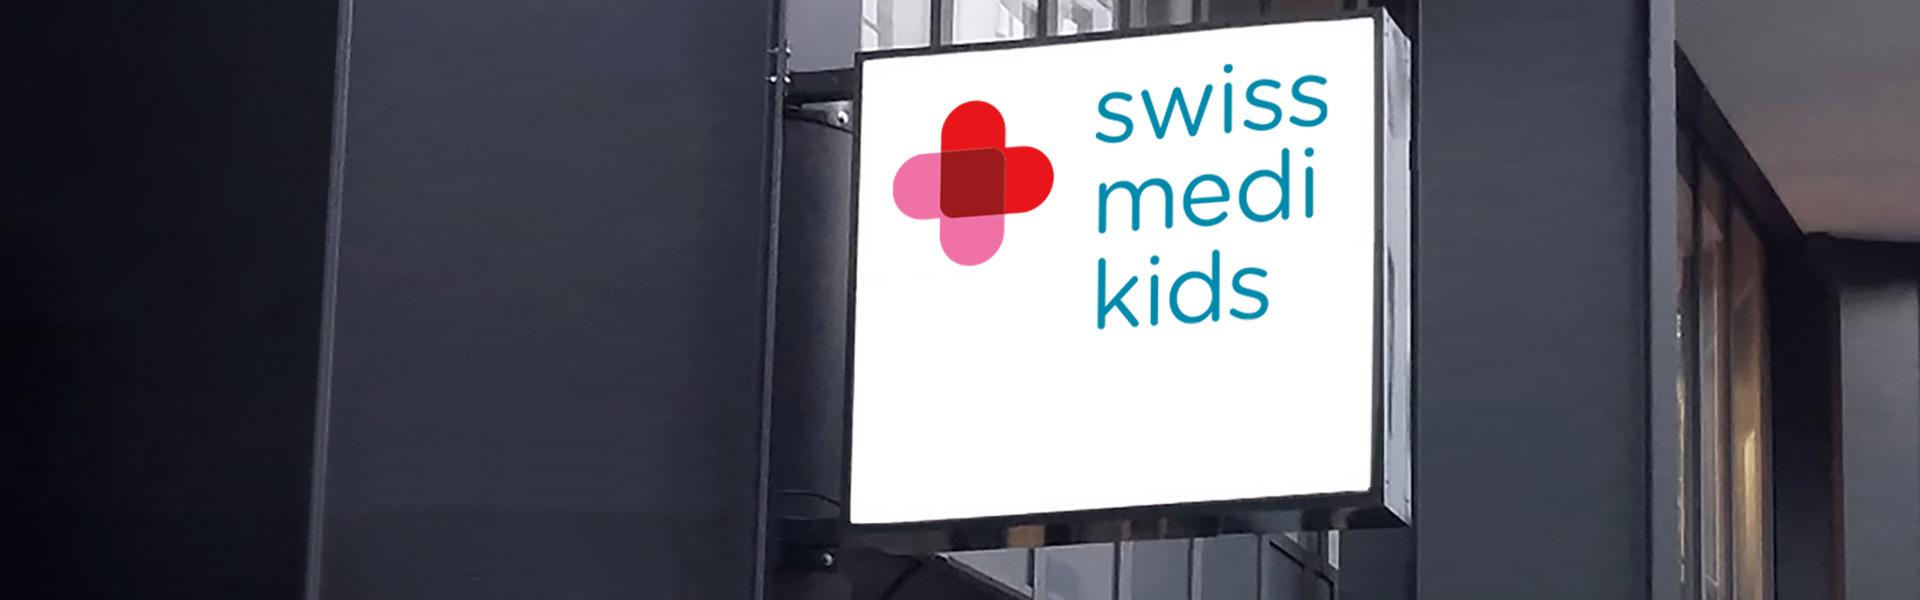 Swiss Medi Kids Kinder Permanence Standorte Hero